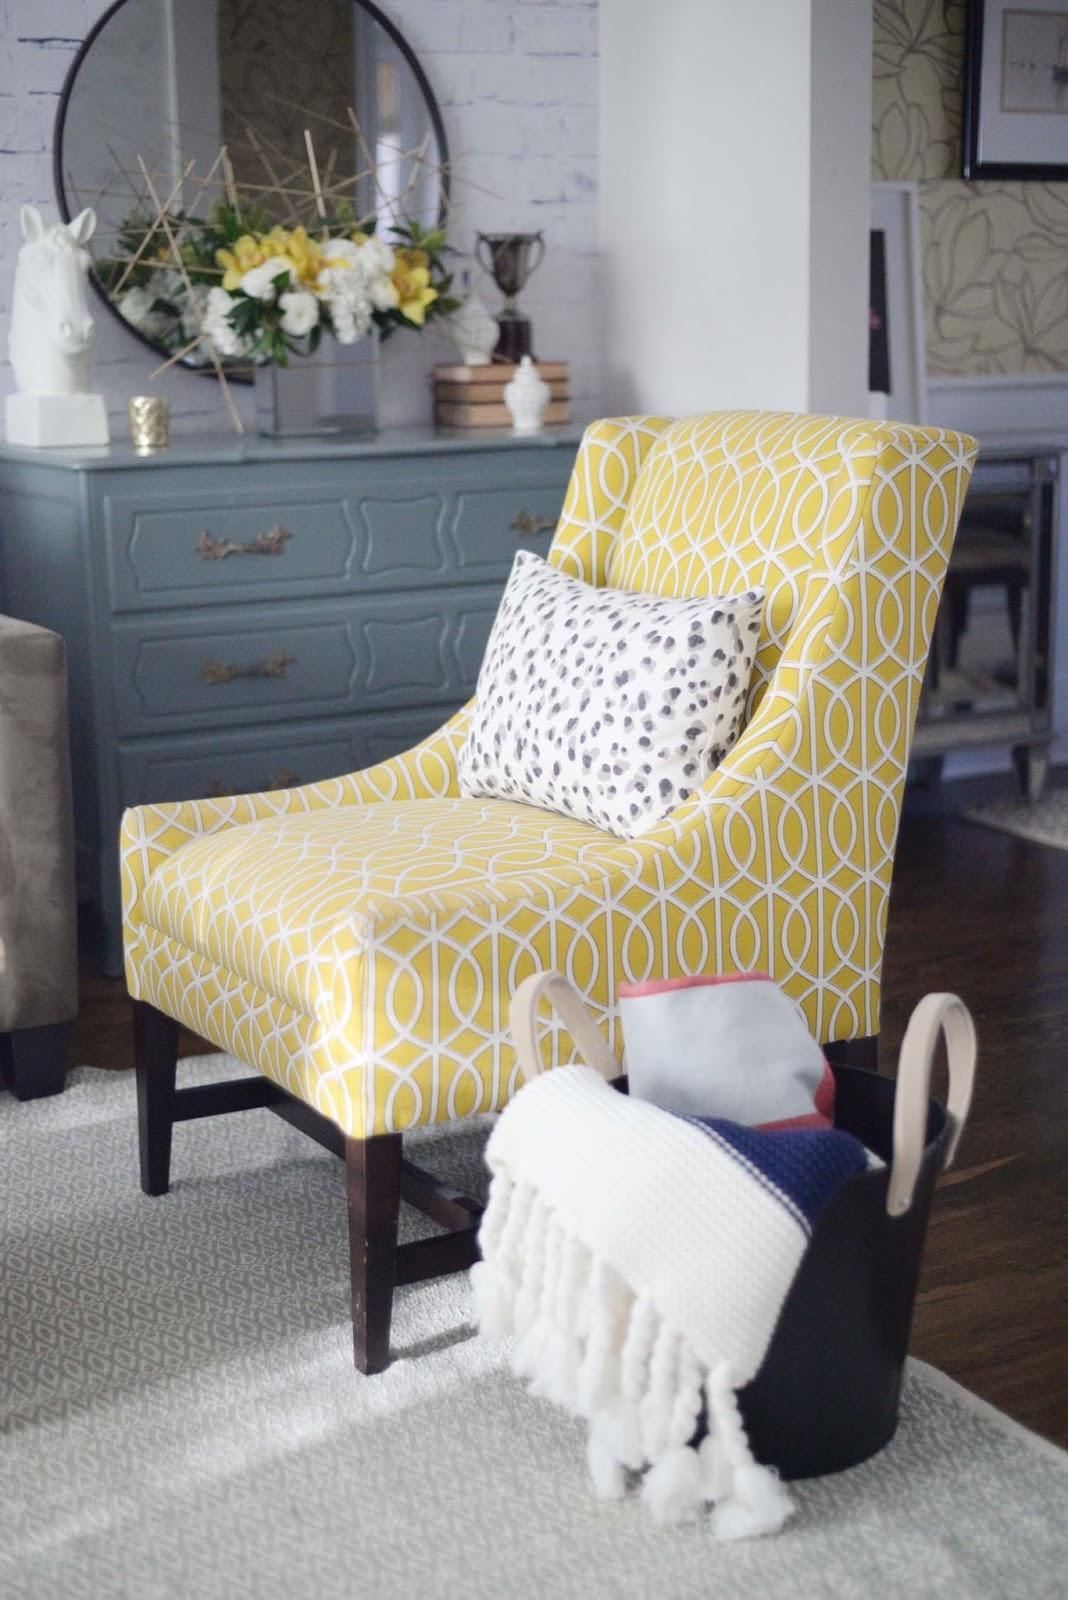 Wayfair Winter Refresh | Dwell Studio Crate & Barrel chair | RamblingRenovators.ca